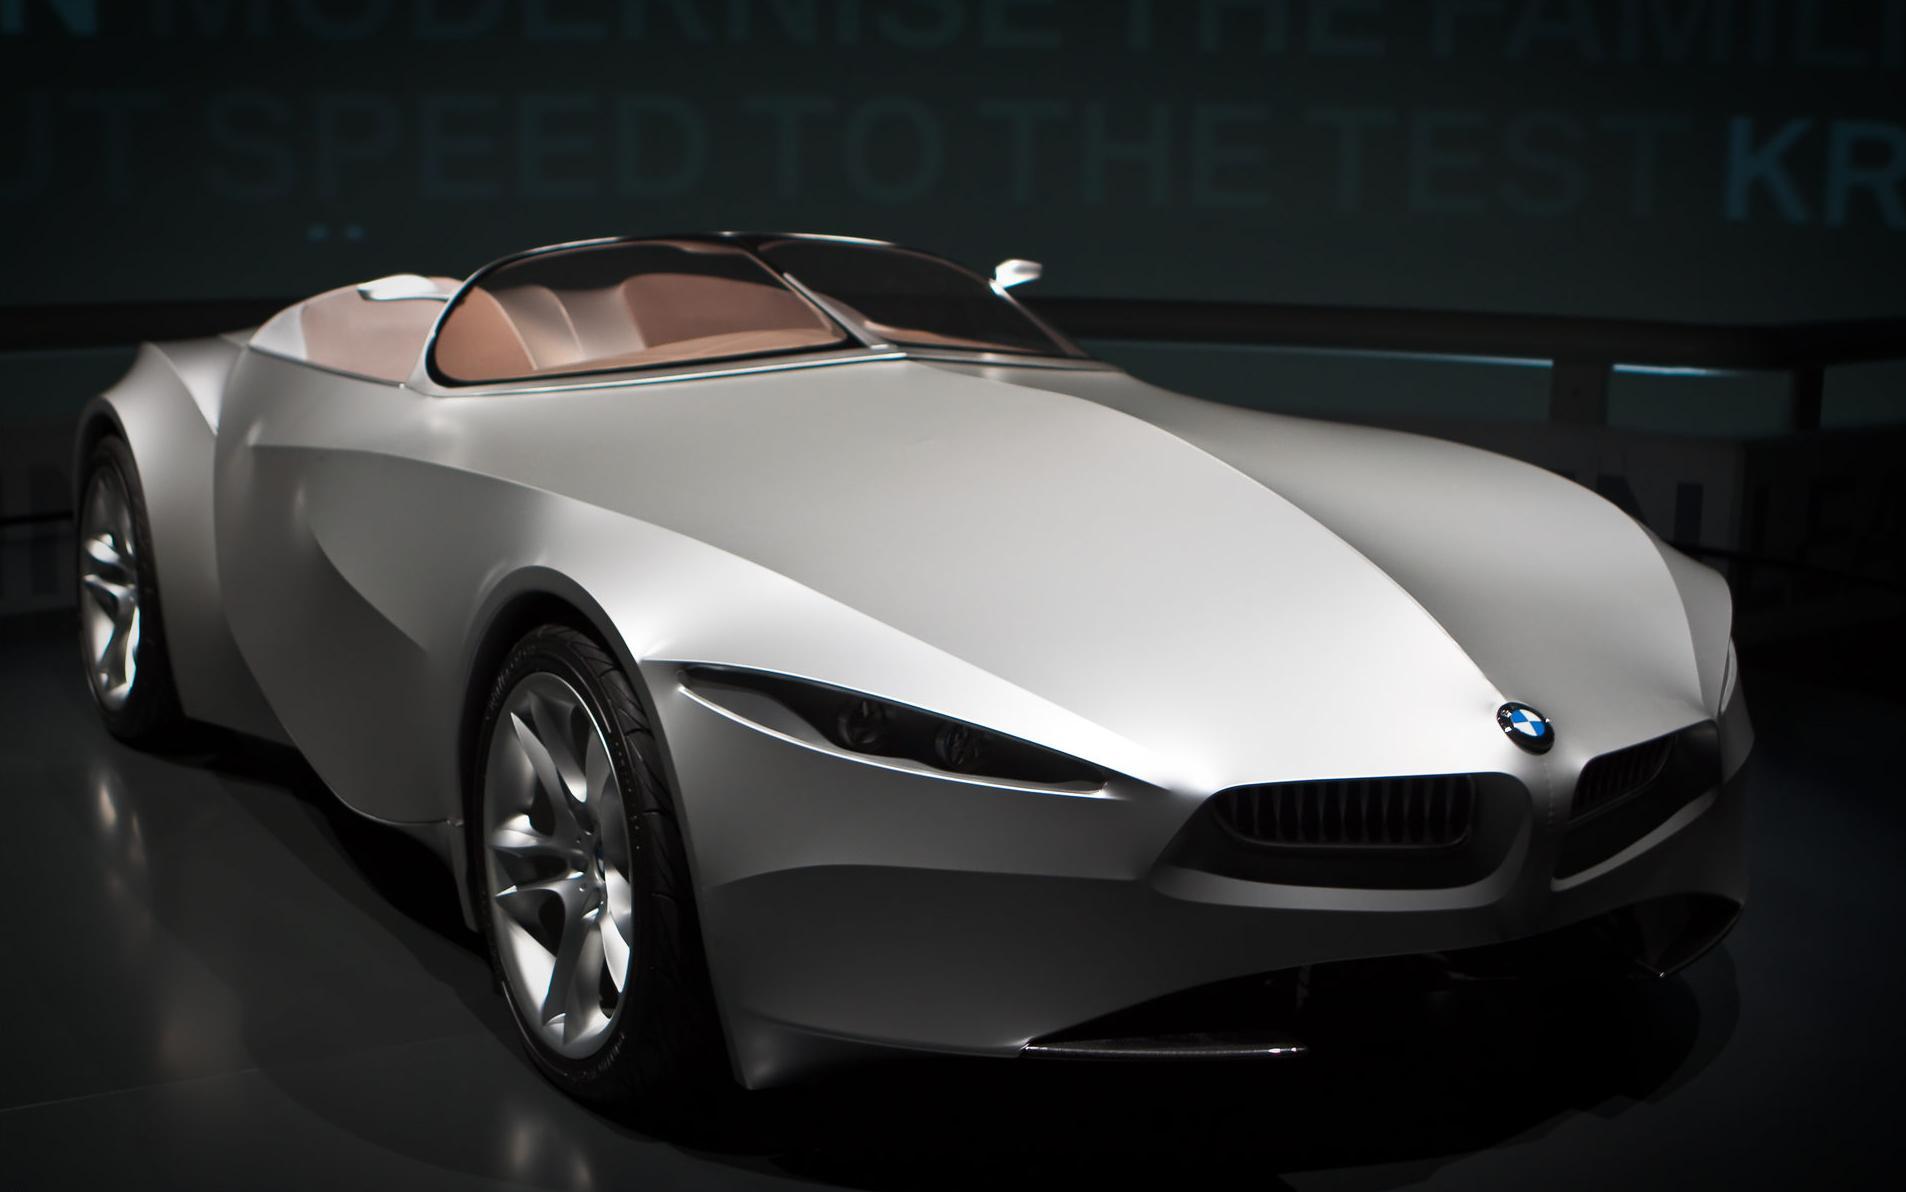 bmw, gina, shape shifting, car, future